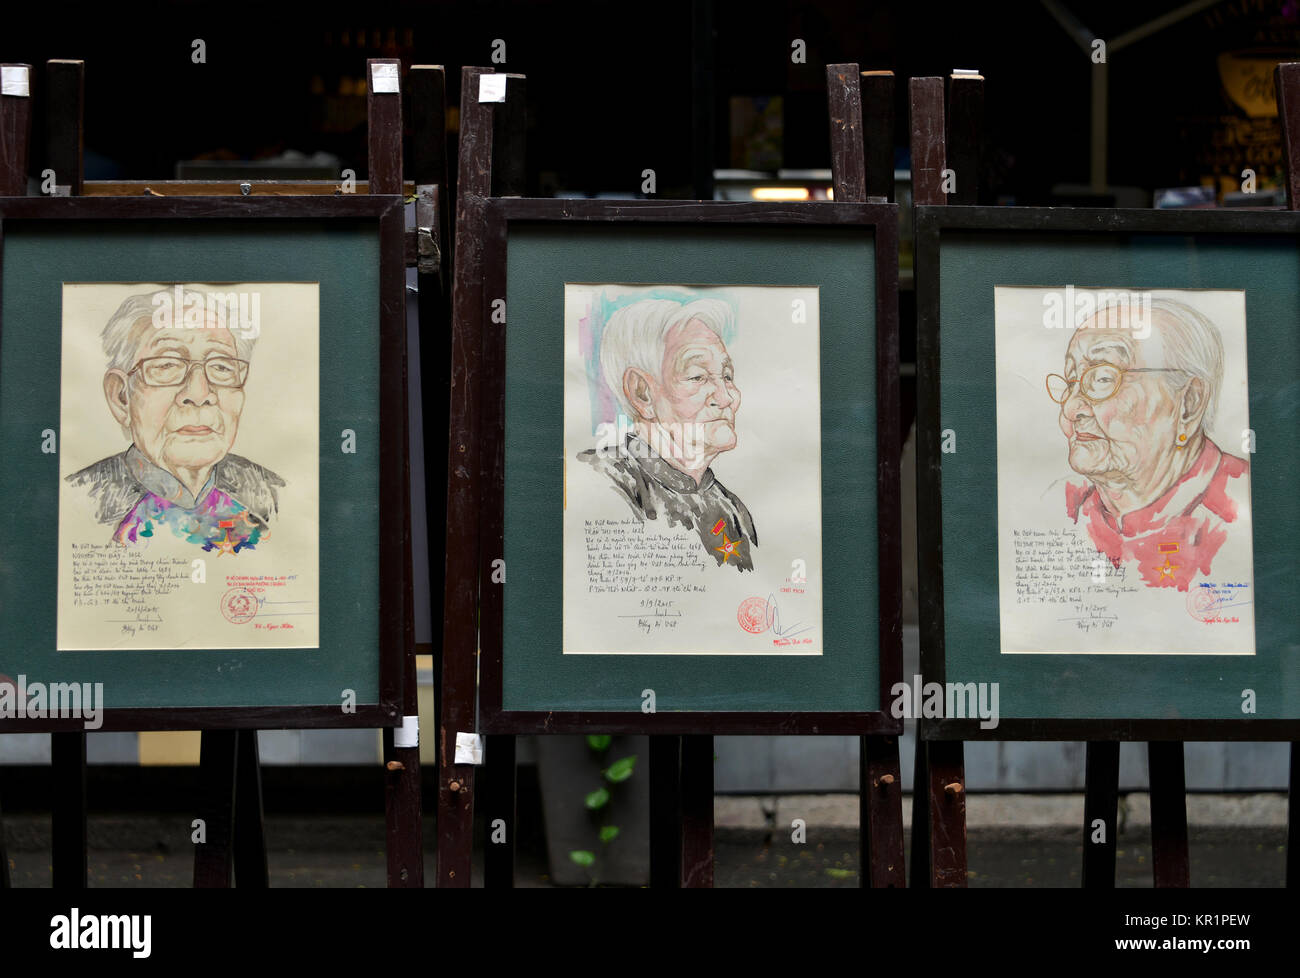 Earned of the Vietnam war, watercolour, Buchstrasse, Nguyen van Binh, Ho Chi Minh City, Vietnam, Verdiente des Vietnamkriegs, - Stock Image